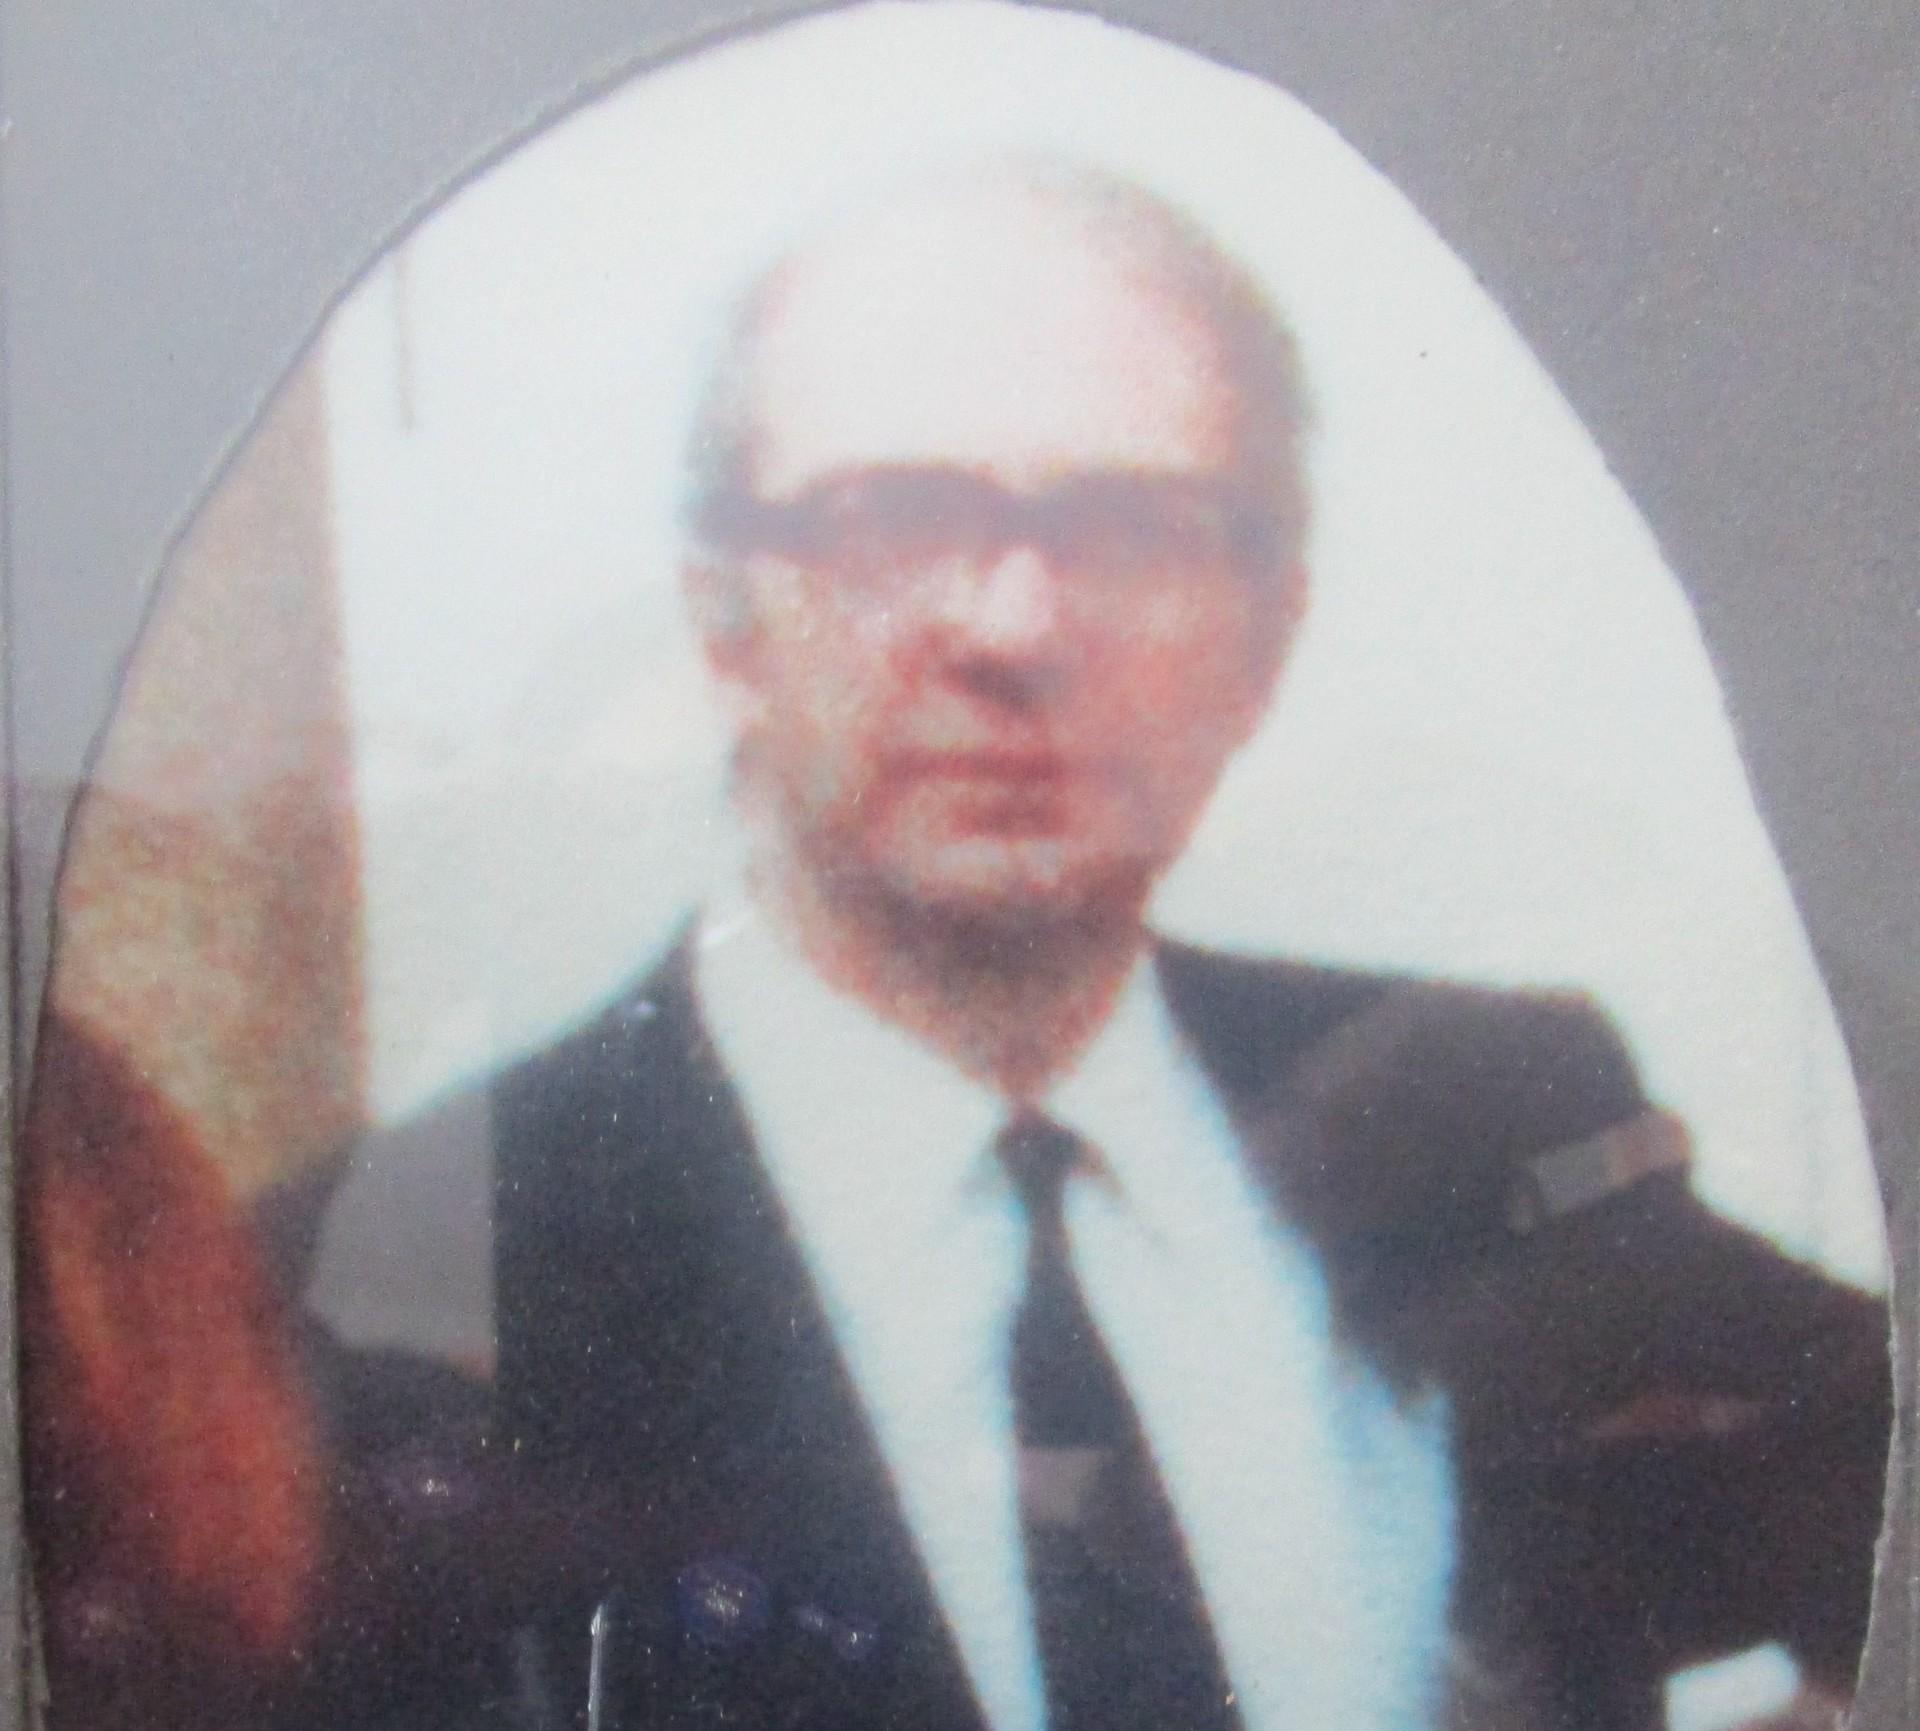 reverend roger smith 1970 1982 christ church urc bellingham green se6 3hq 2015